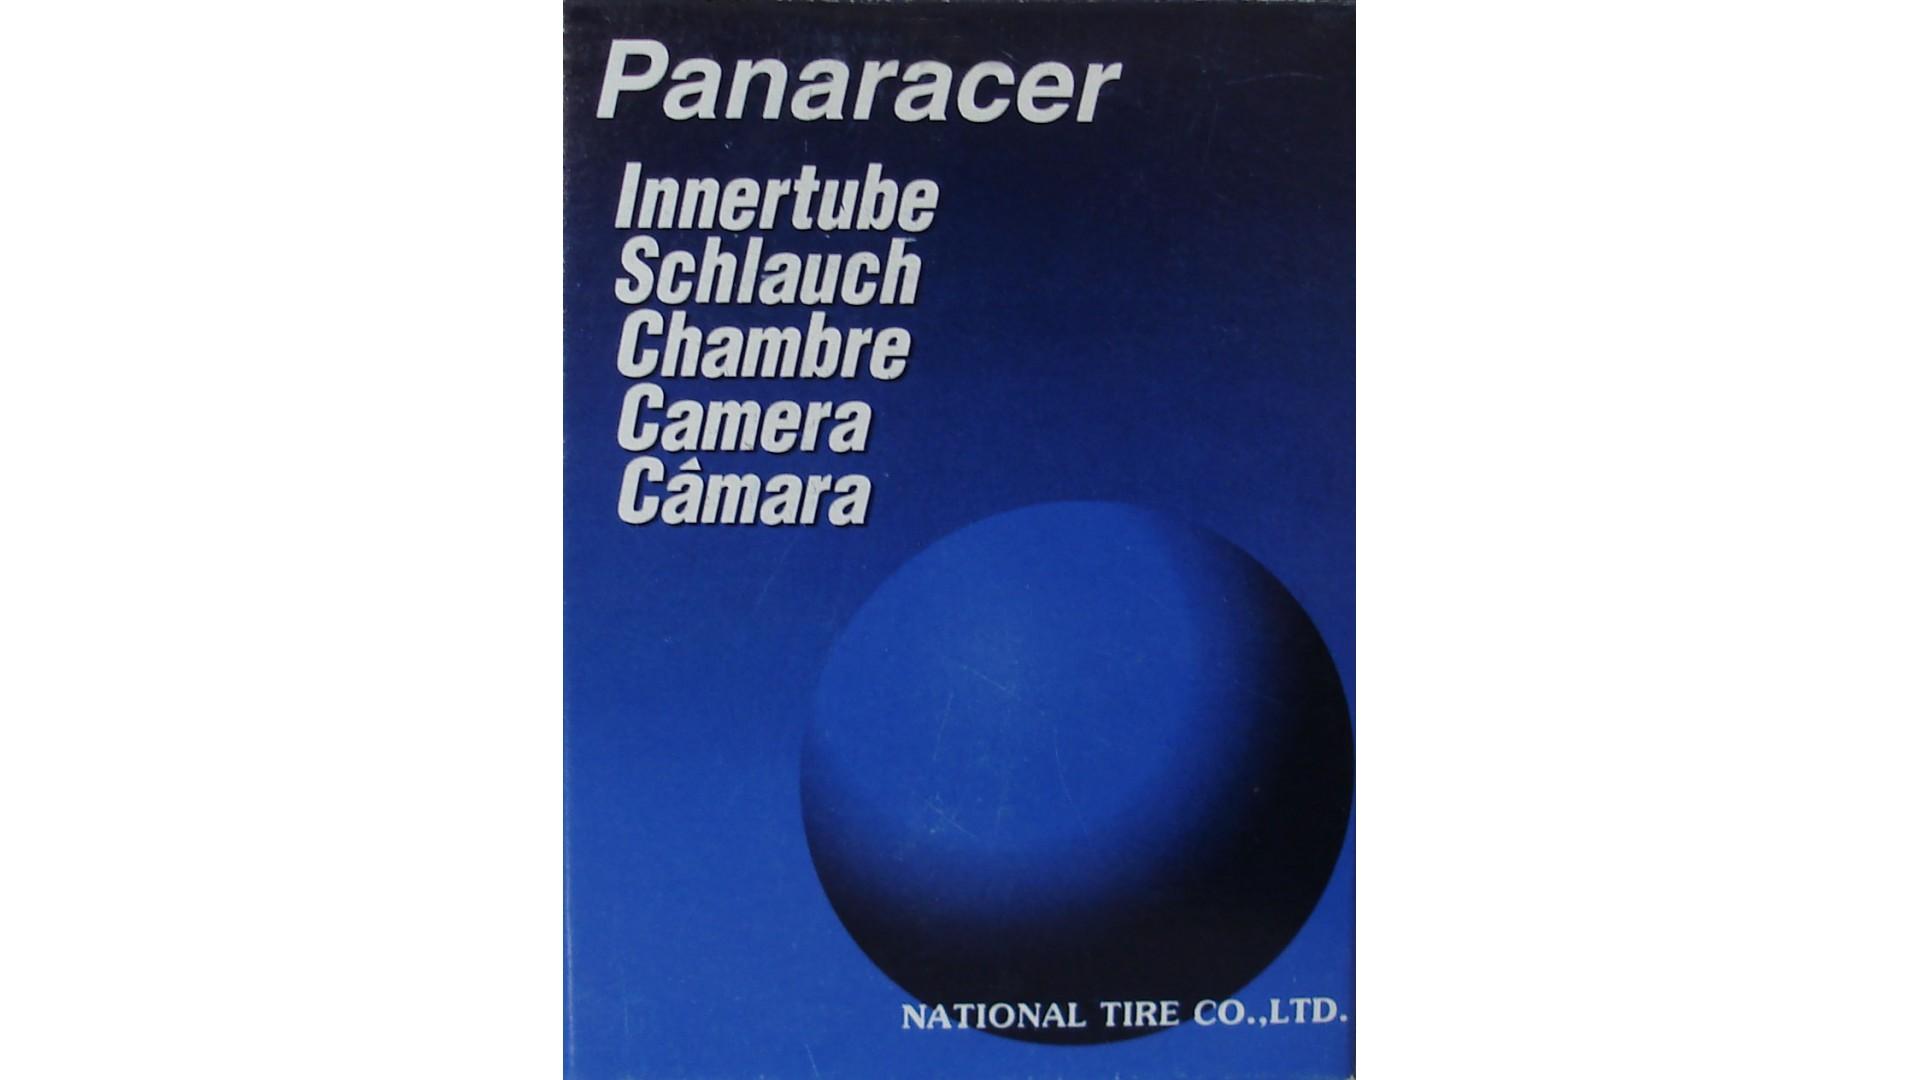 Камера Panaracer 20 x 1.50 - 2.1 American